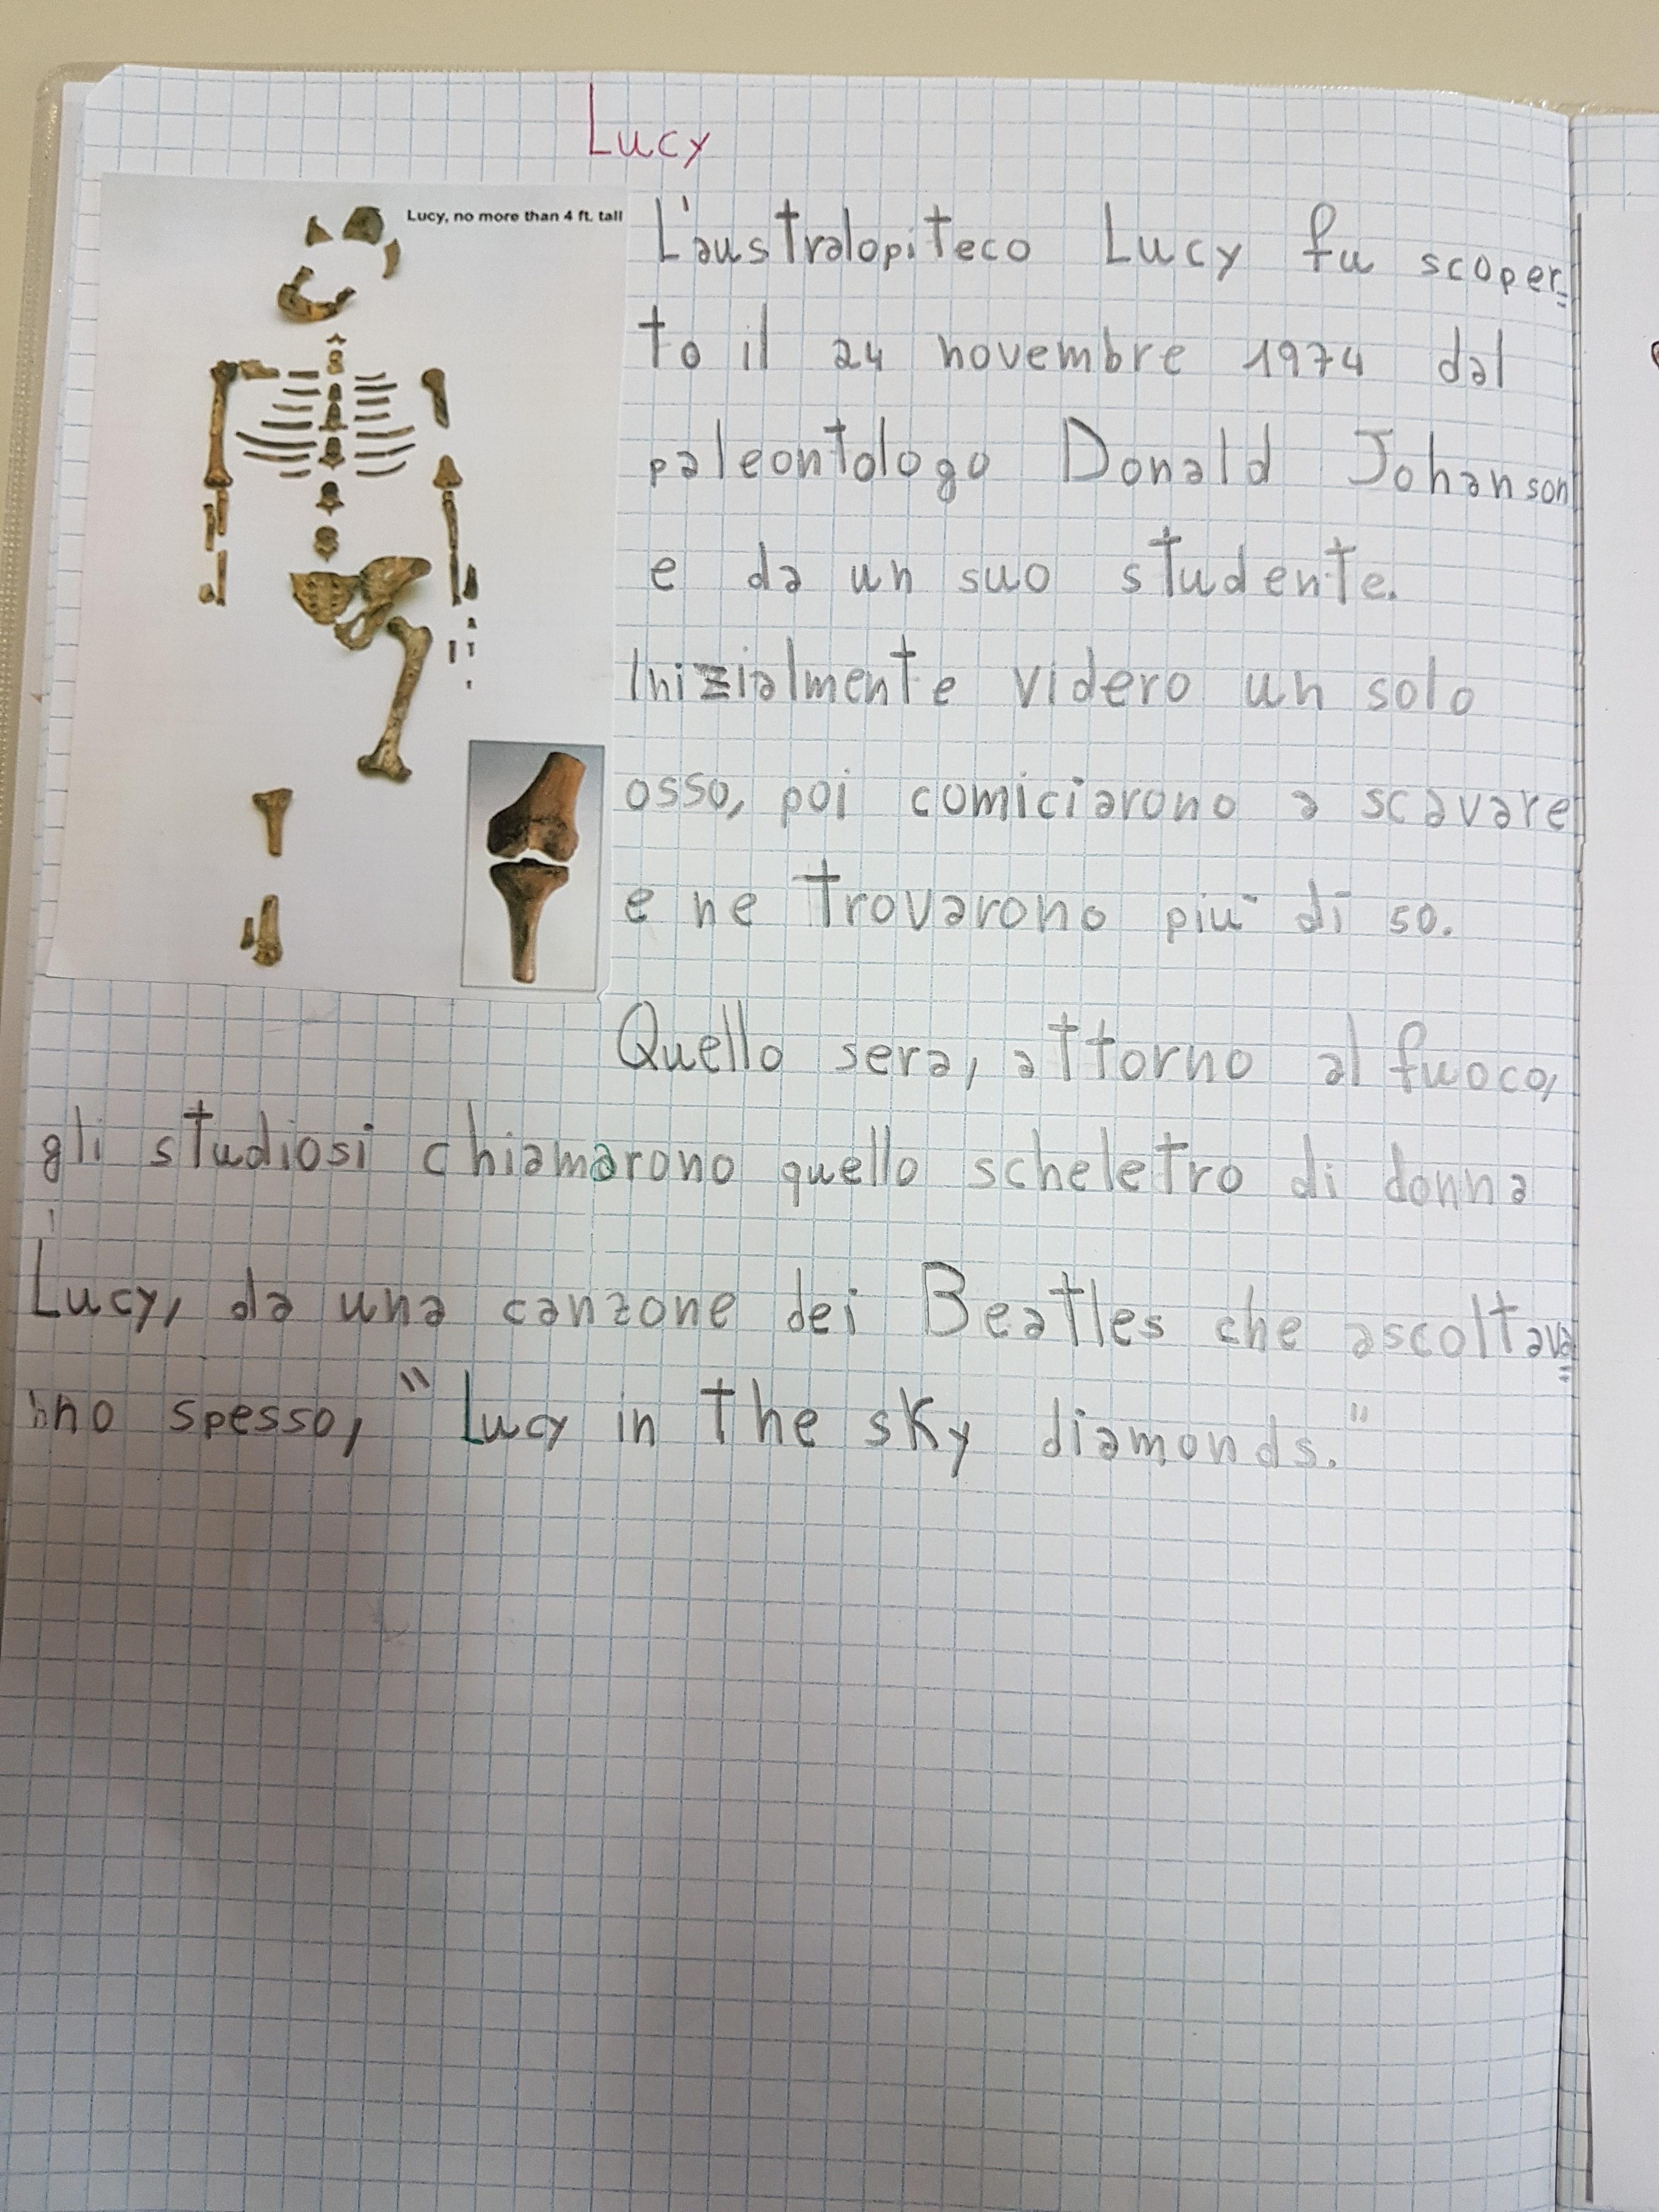 Lucy & co (gli Australopitechi) – Maestra Carmelina